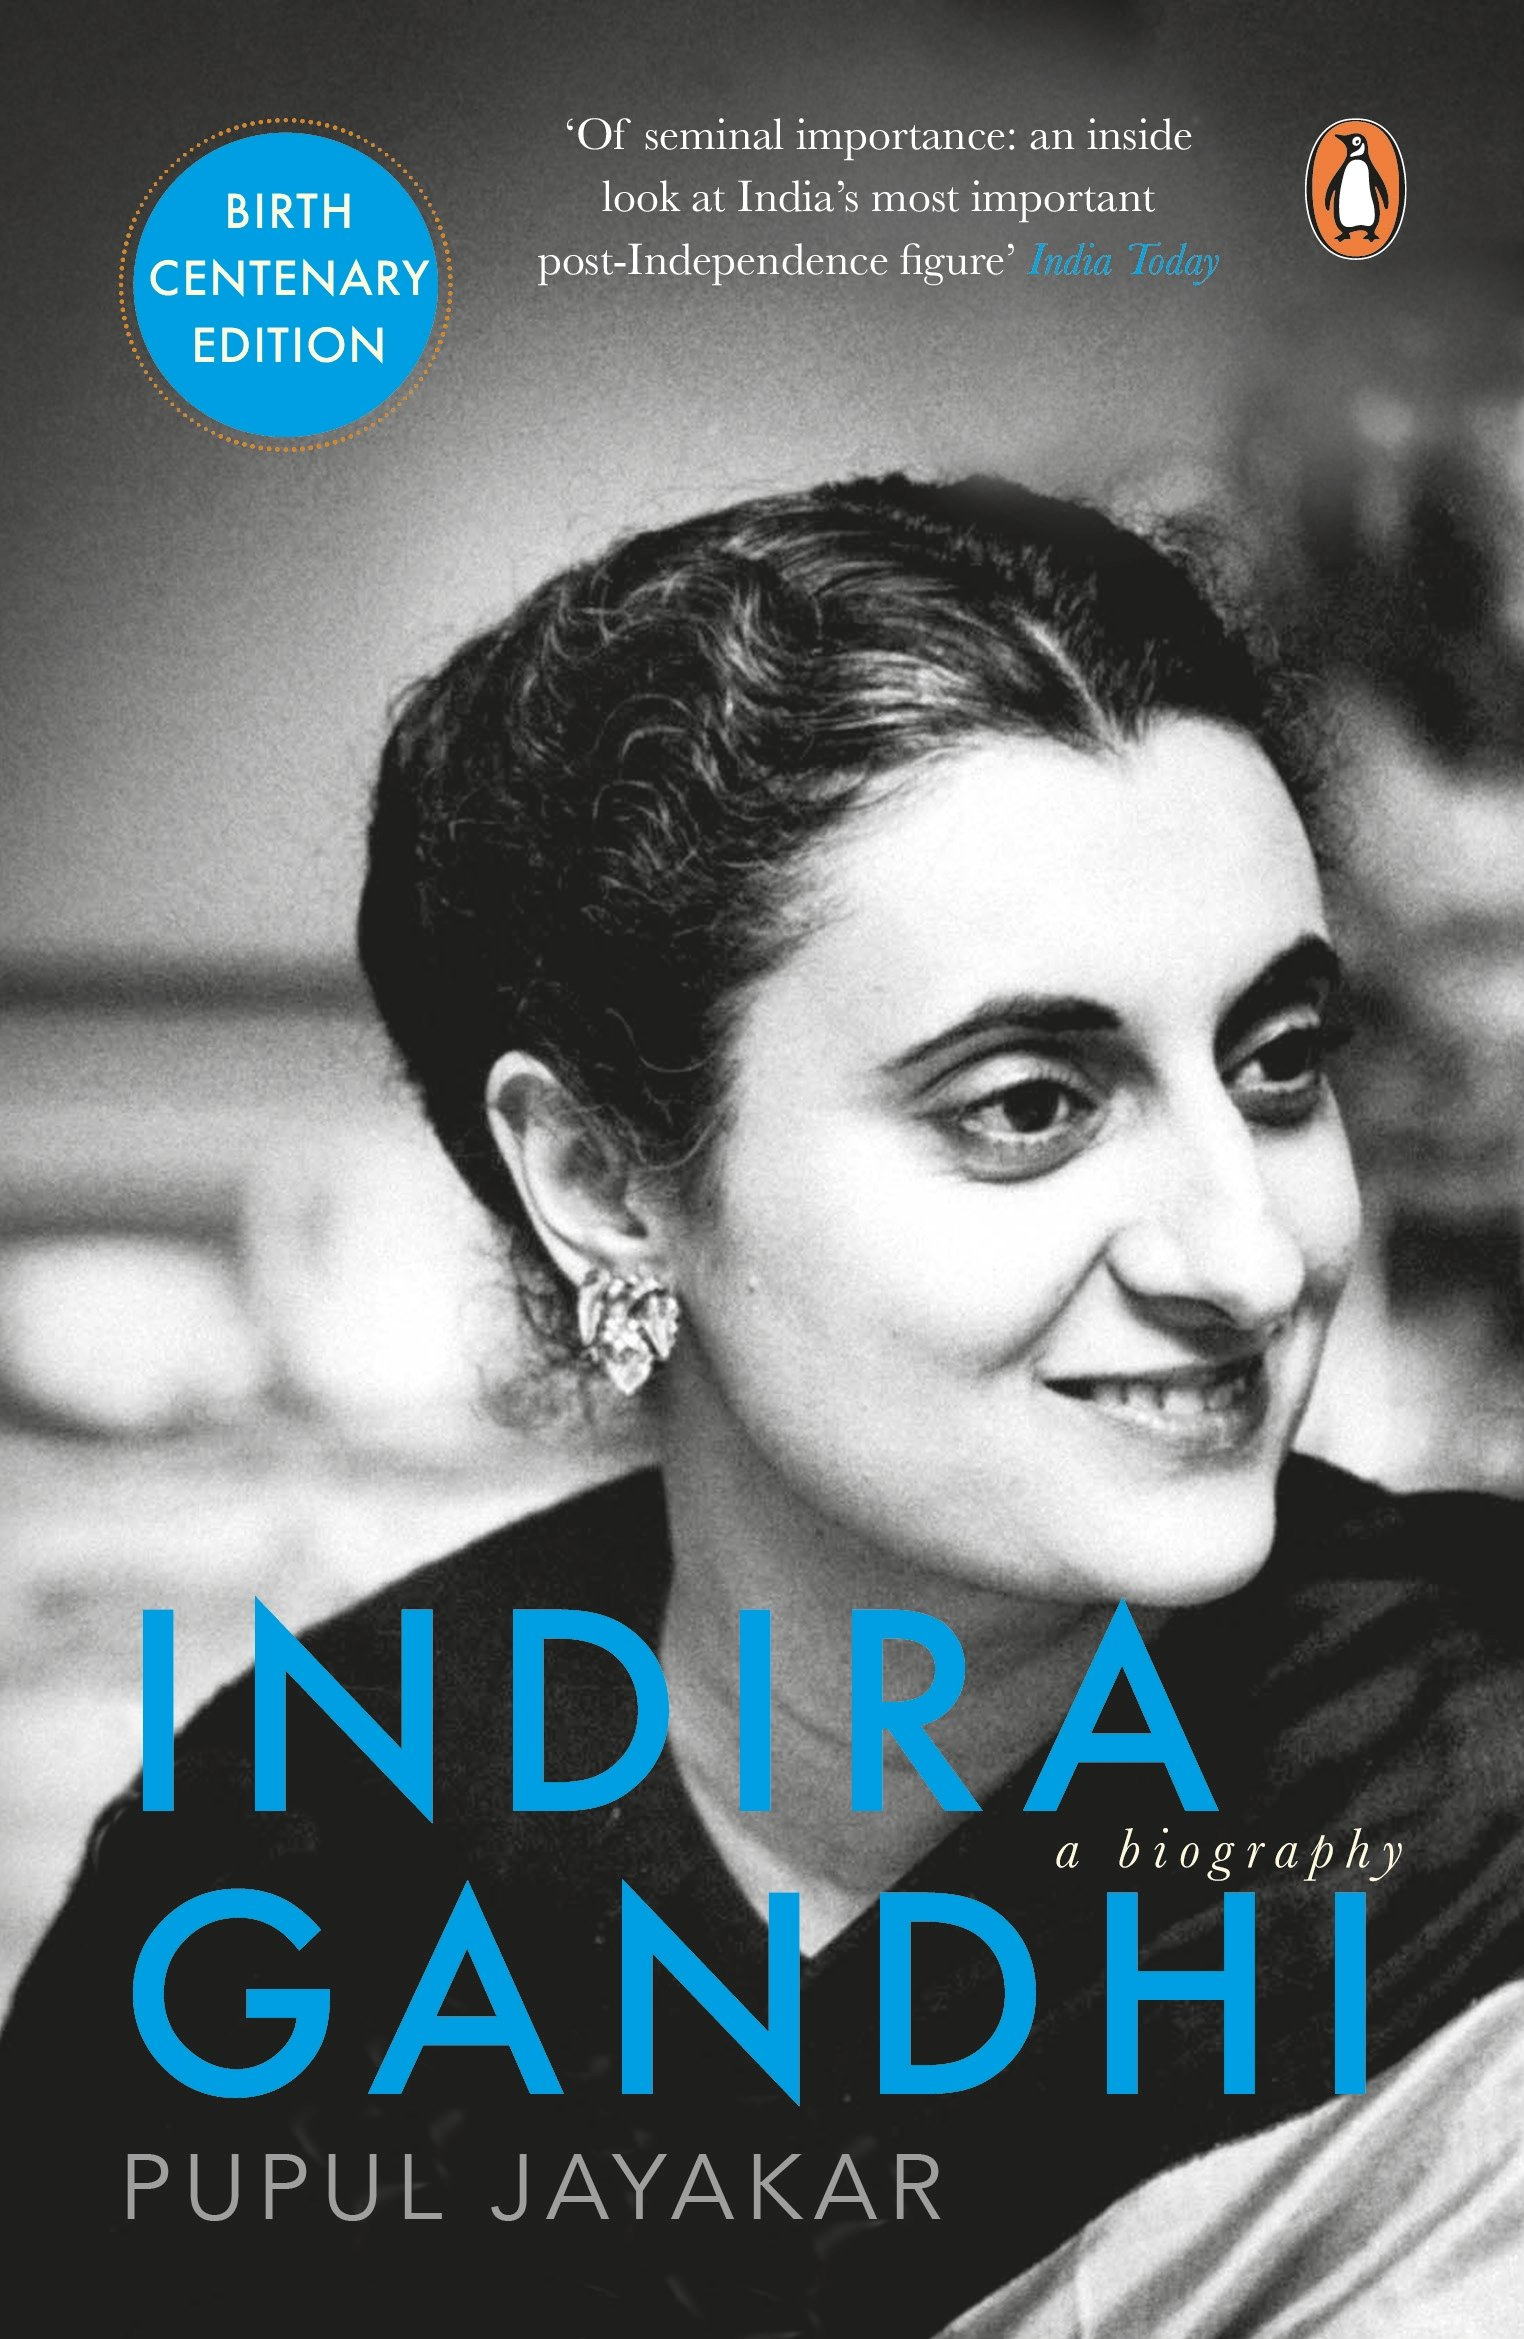 Indira Gandhi: A Biography: Amazon.es: Pupul Jayakar: Libros en idiomas extranjeros